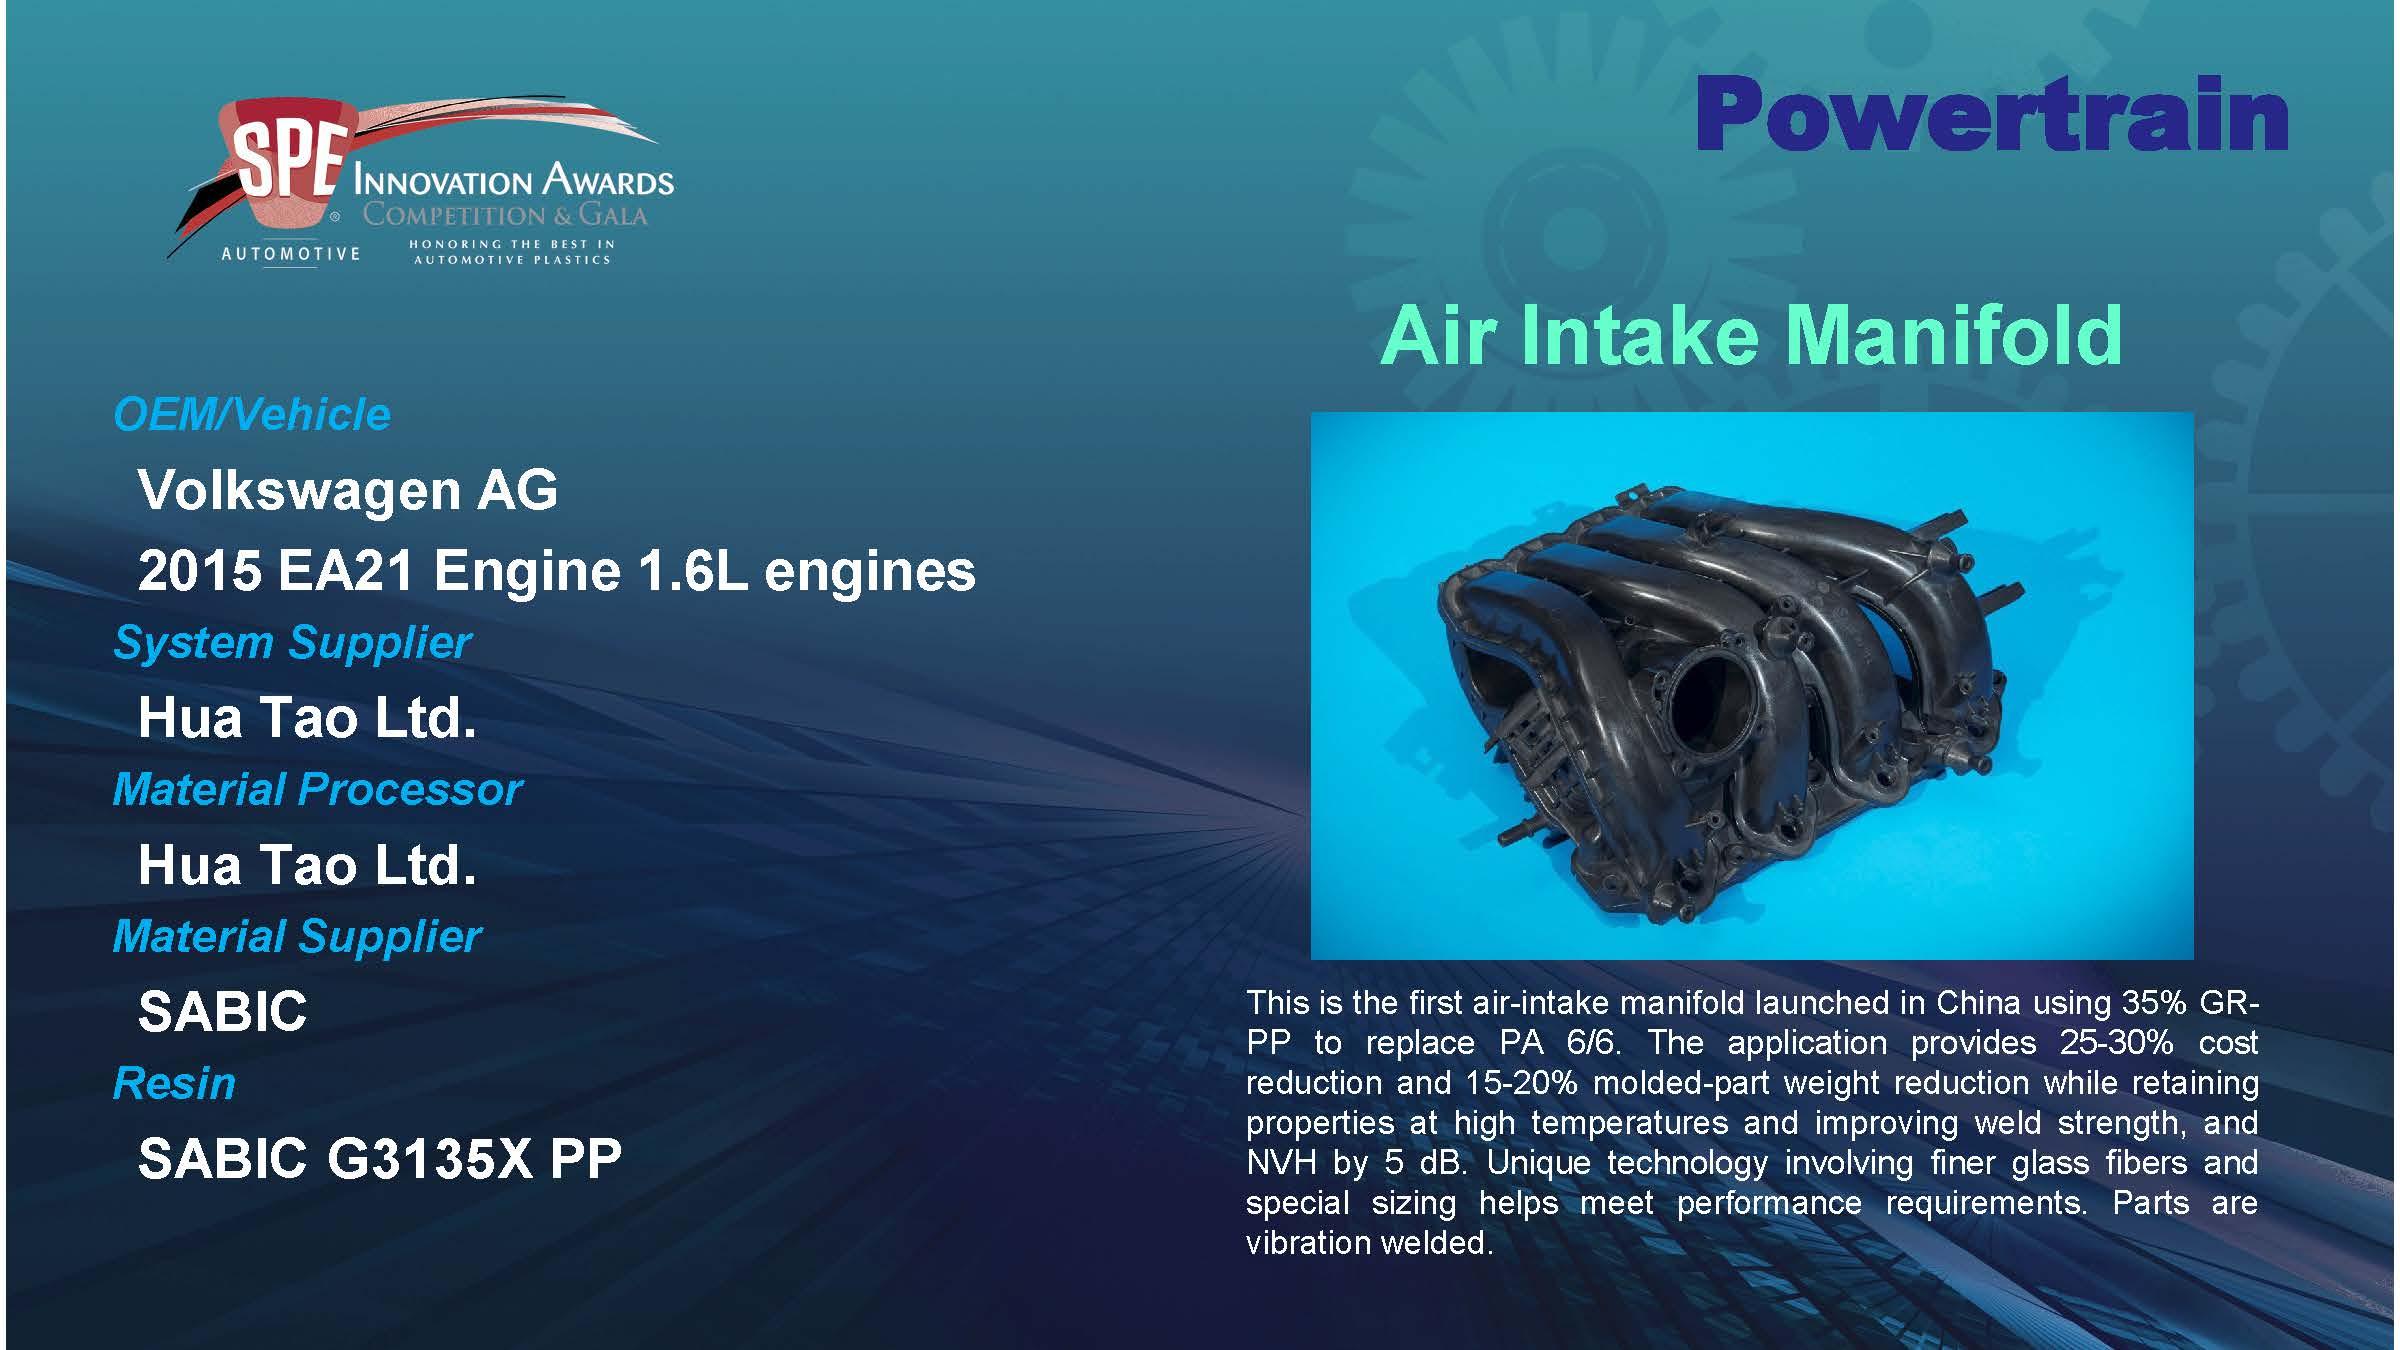 Air Intake Manifold was Powertrain Category Winner @ 46th